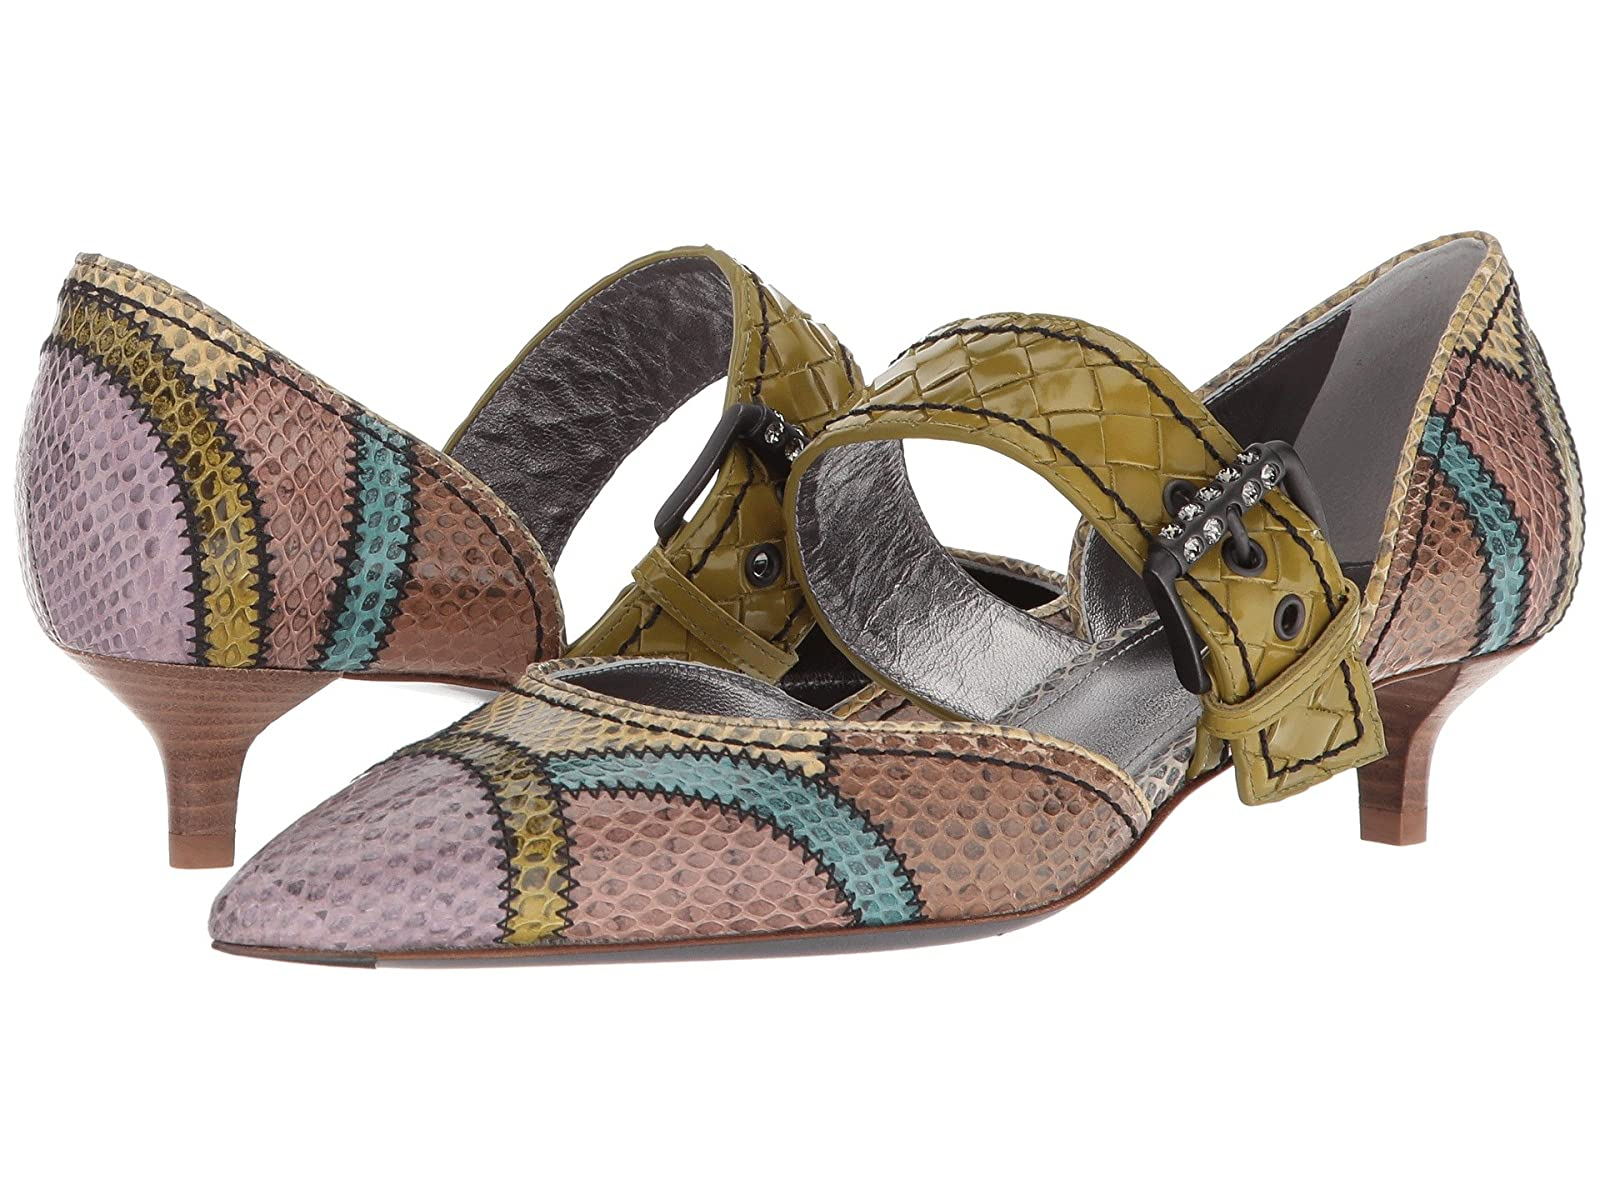 Bottega Veneta Buckle Dorsey 3.5cm PumpAtmospheric grades have affordable shoes